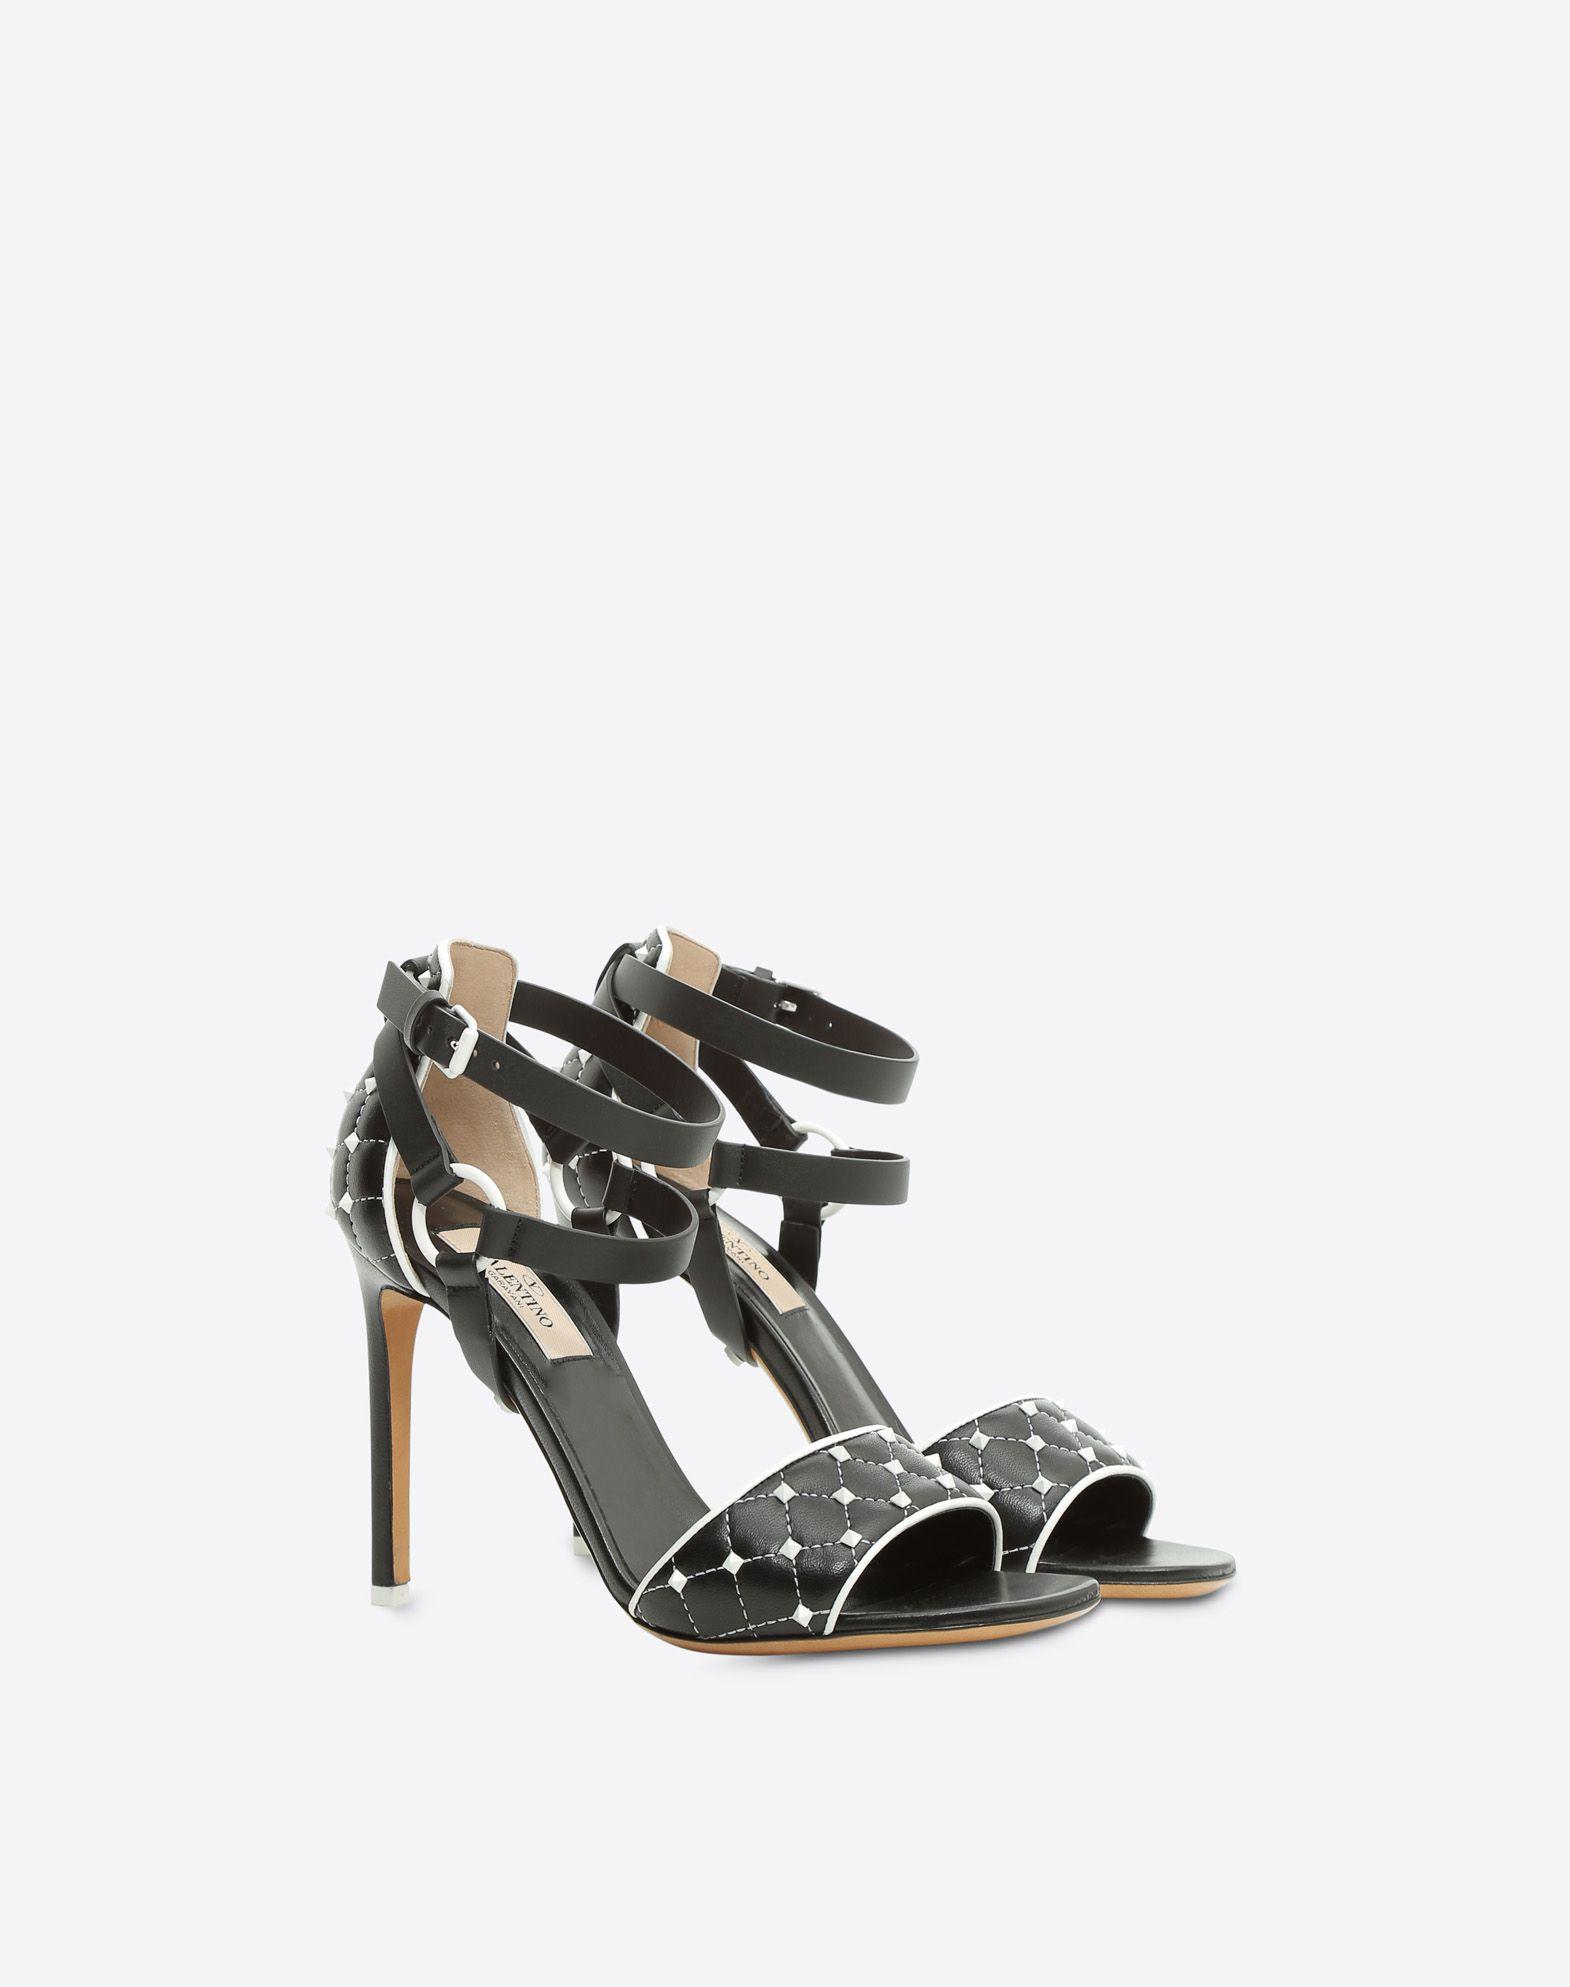 VALENTINO GARAVANI Free Rockstud Spike 凉鞋 SANDALS TACCO ALTO D r